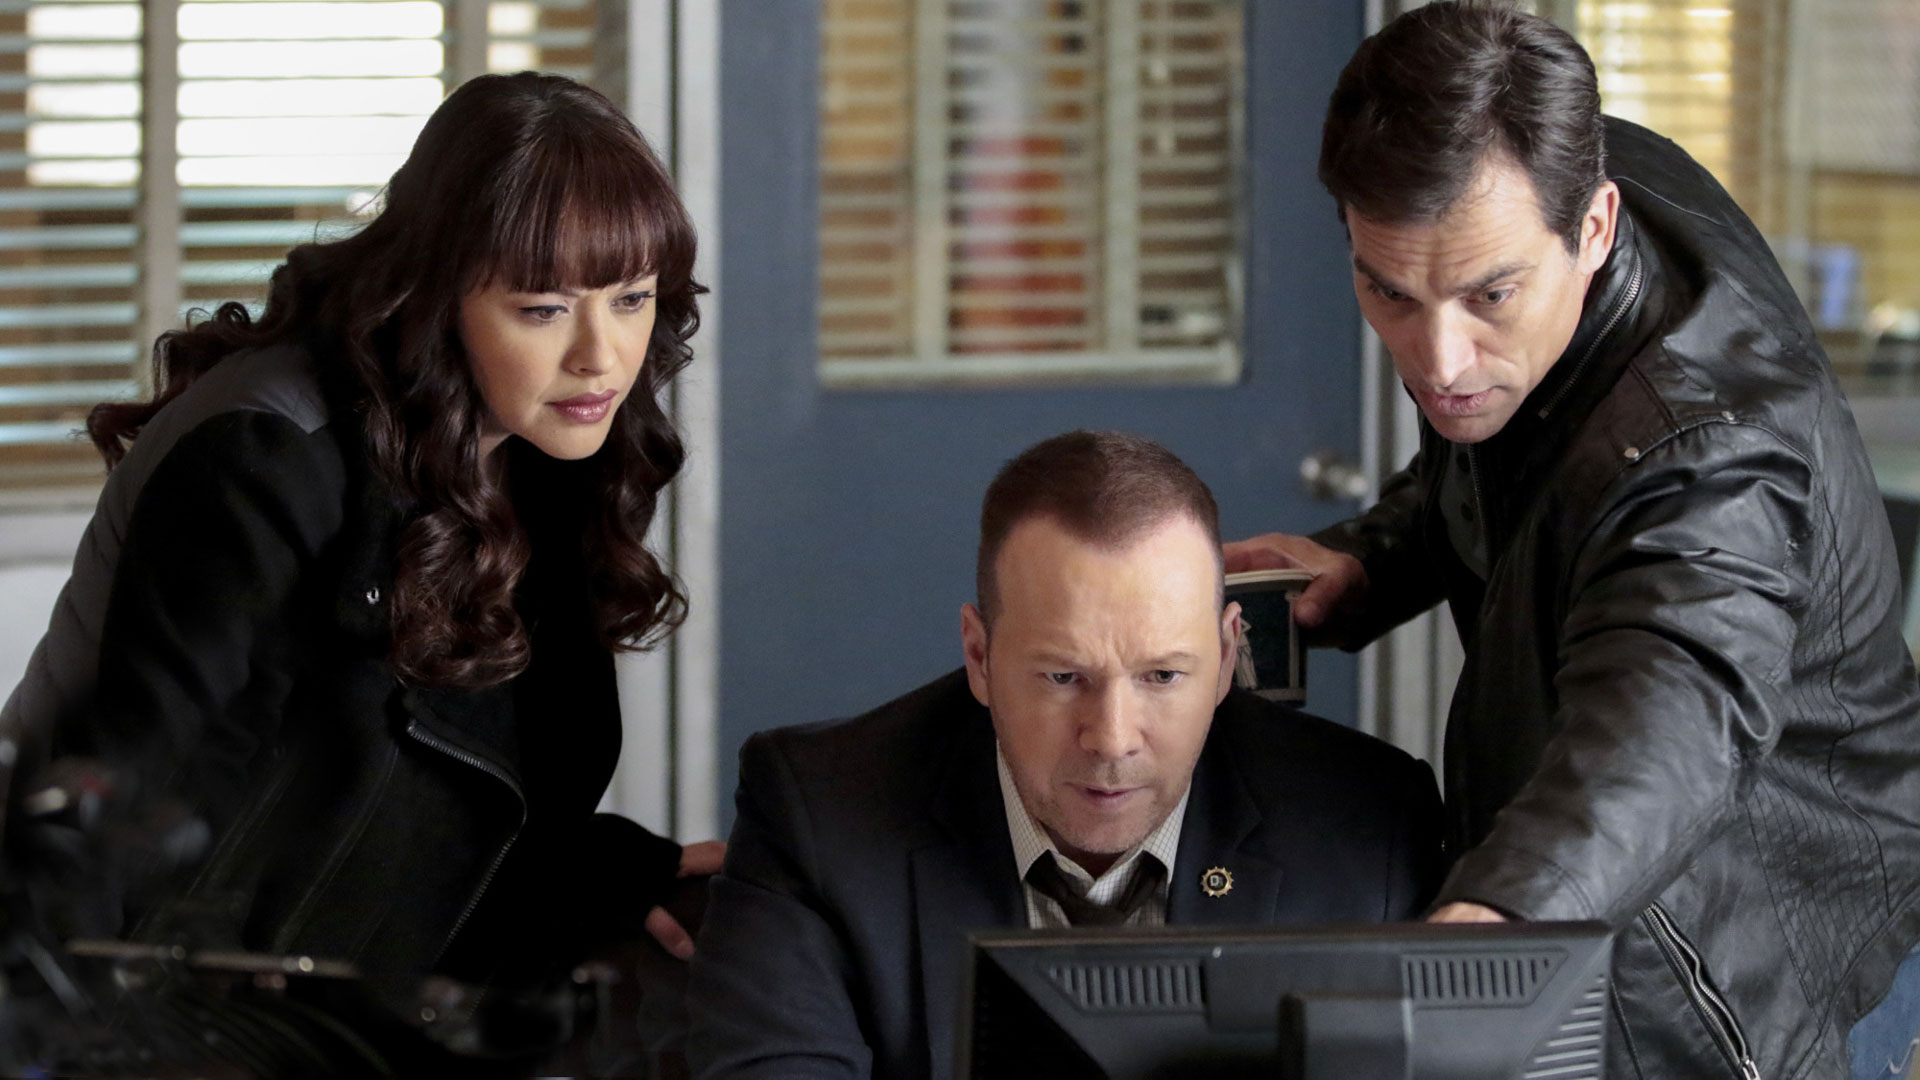 Marisa Ramirez as Detective Maria Baez, Donnie Wahlberg as Detective Danny Reagan, and Johnathon Schaech as Detective Jimmy Mosley